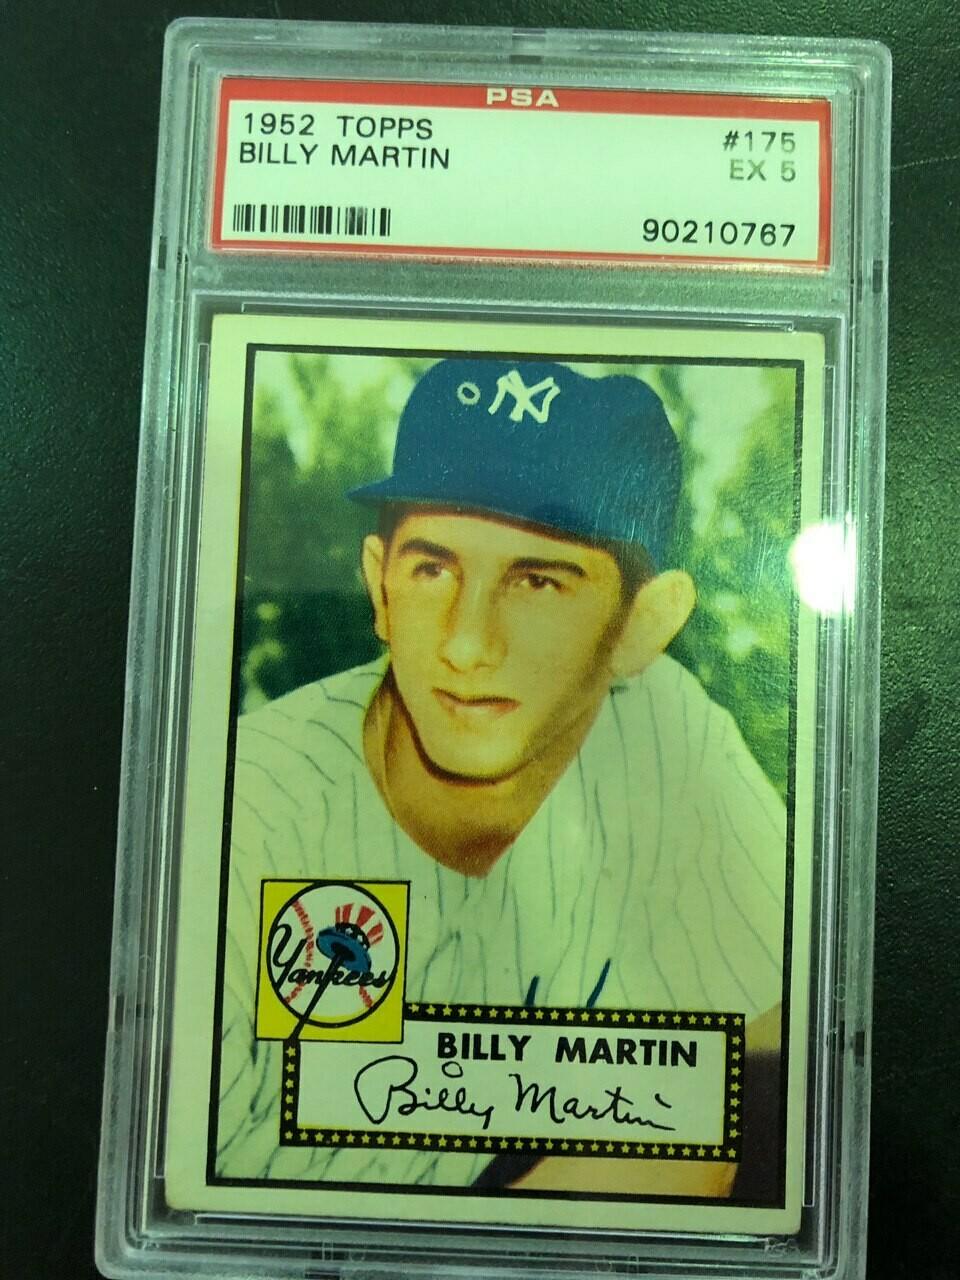 1952 Topps #175 Billy Martin rookie, PSA graded 5